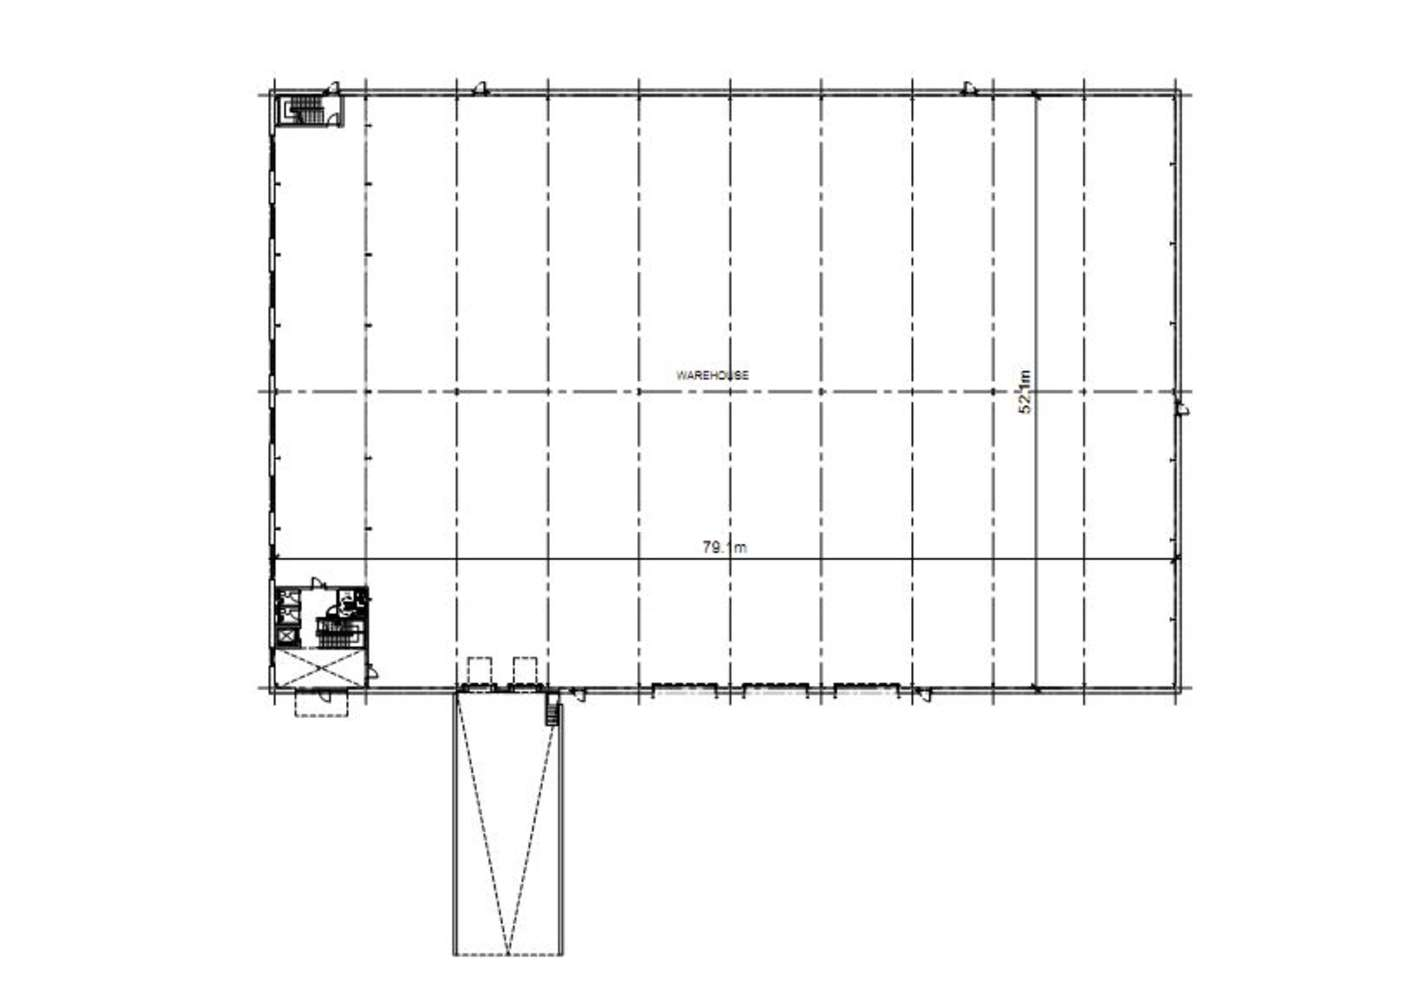 Industrial and logistics Fareham, PO15 5RJ - J9 South - 62005